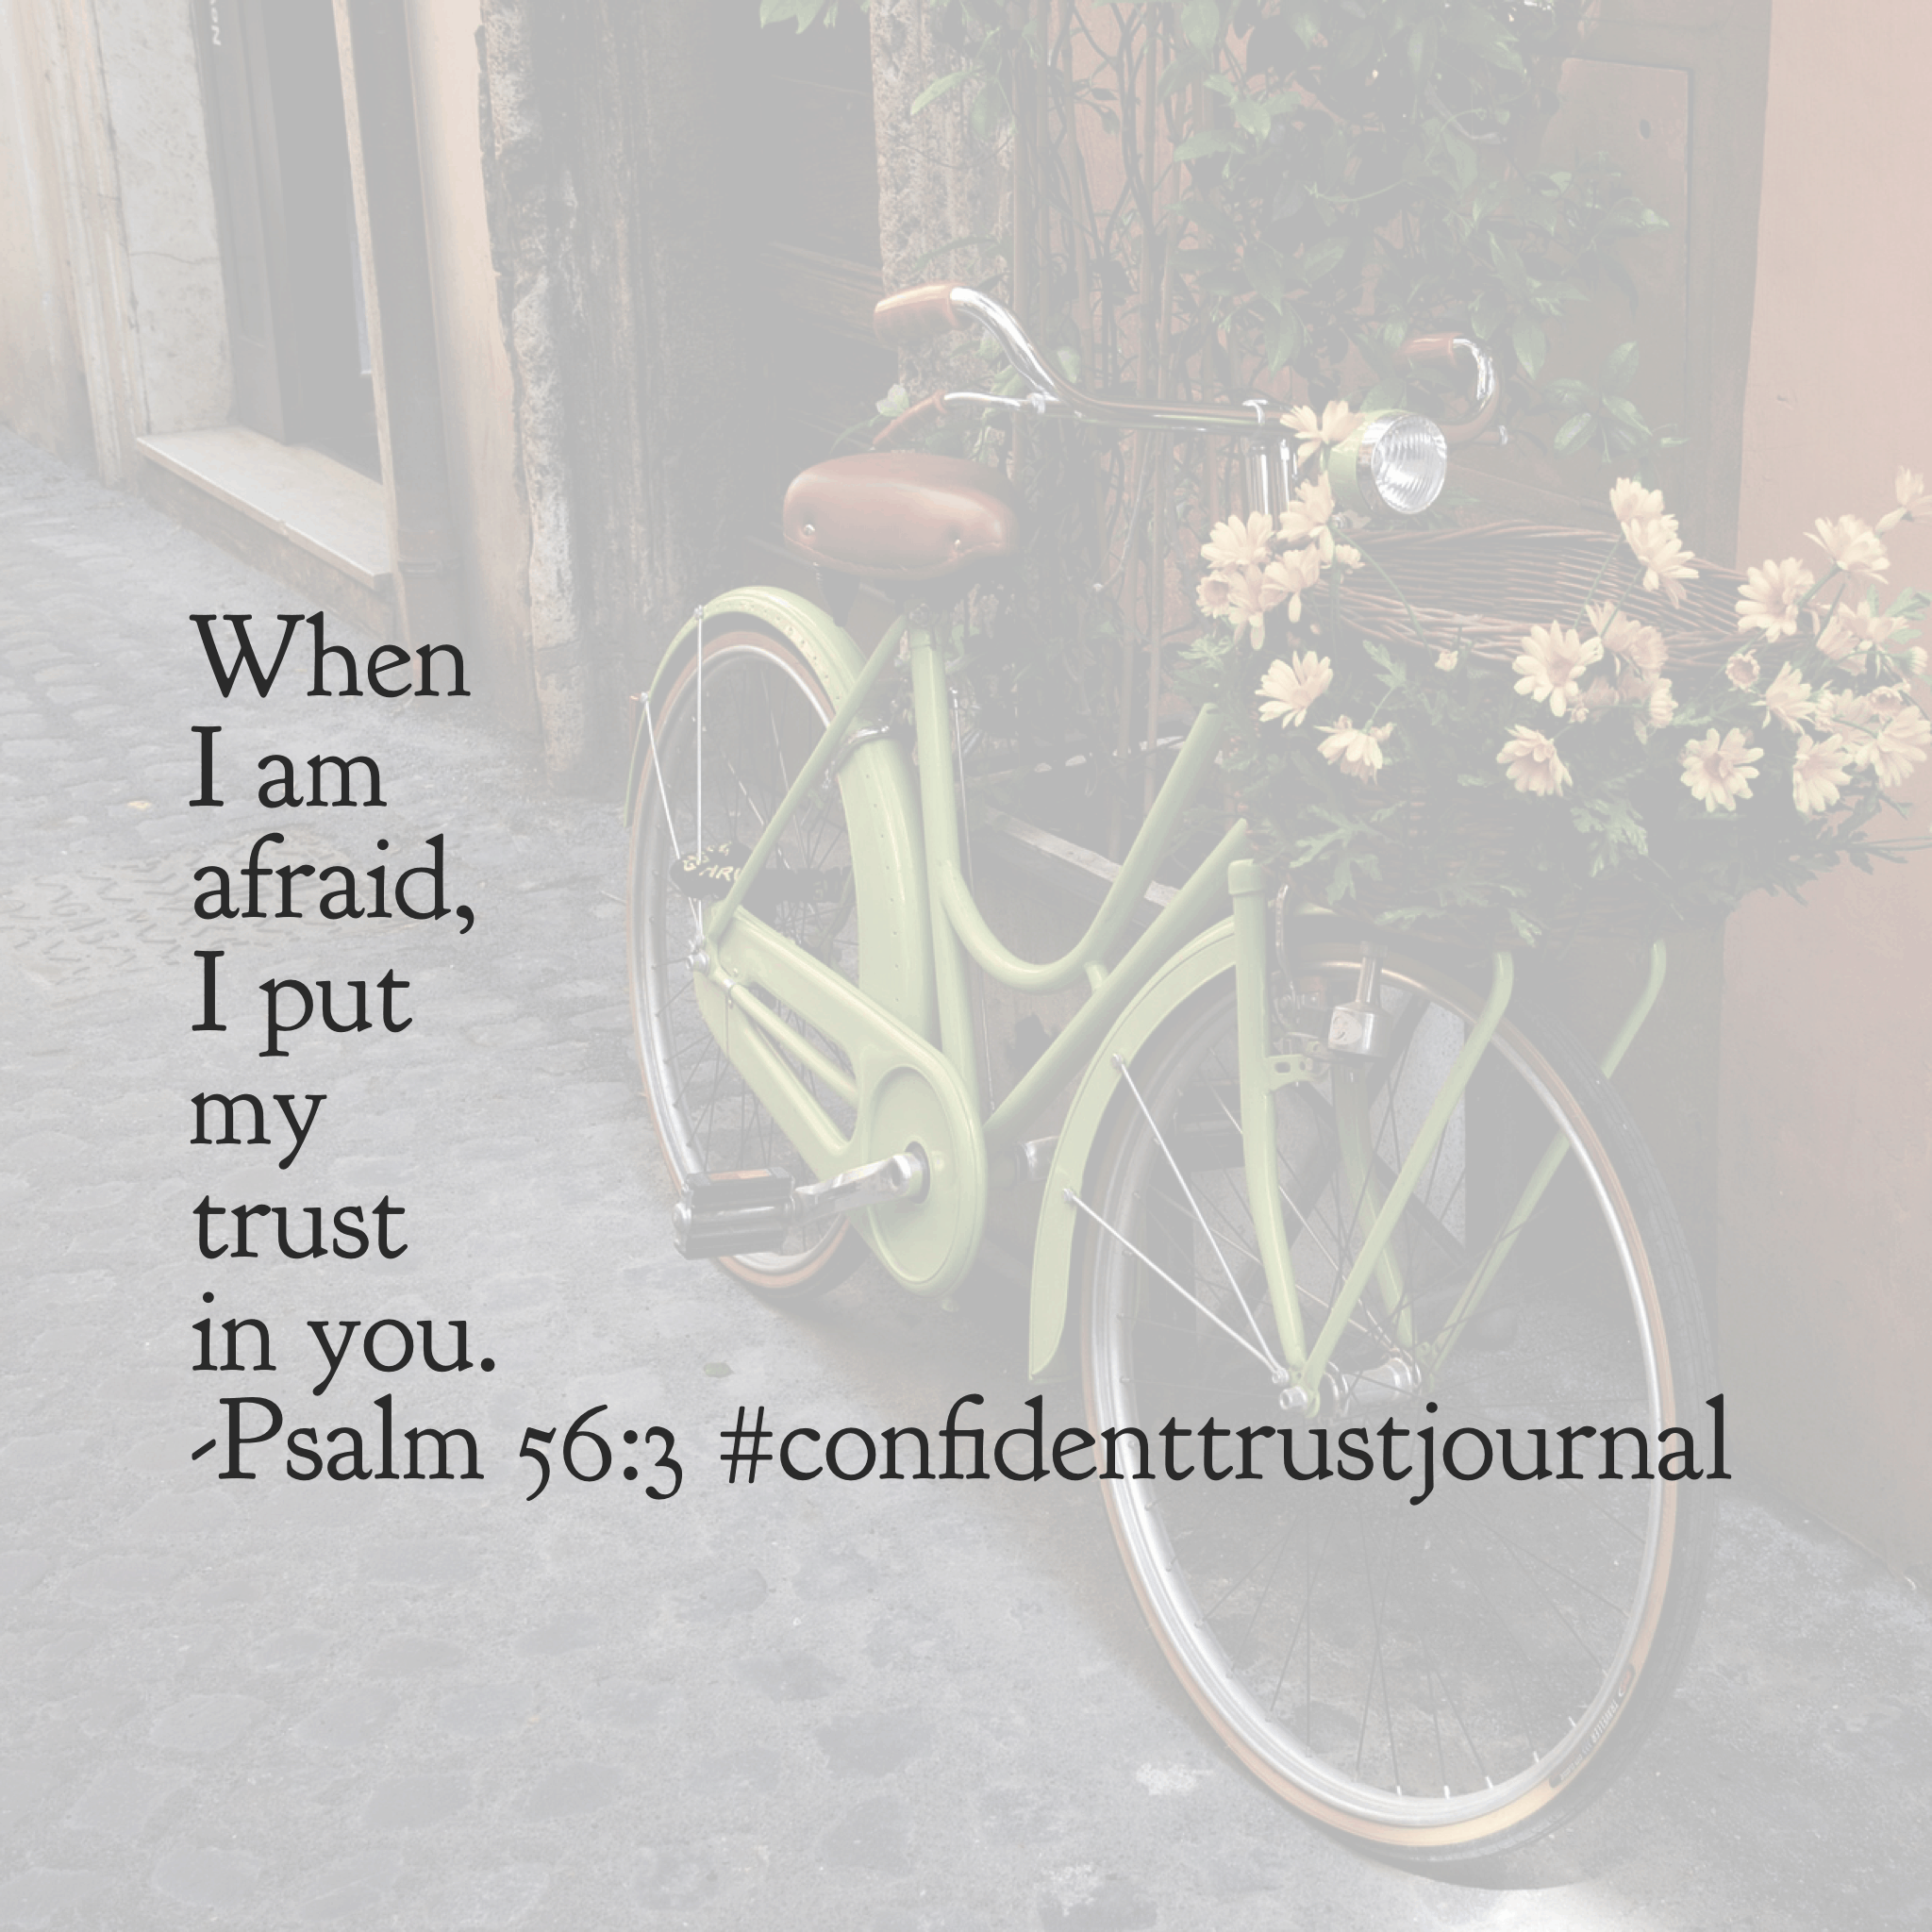 #confidenttrustjournal #biblereadingplan